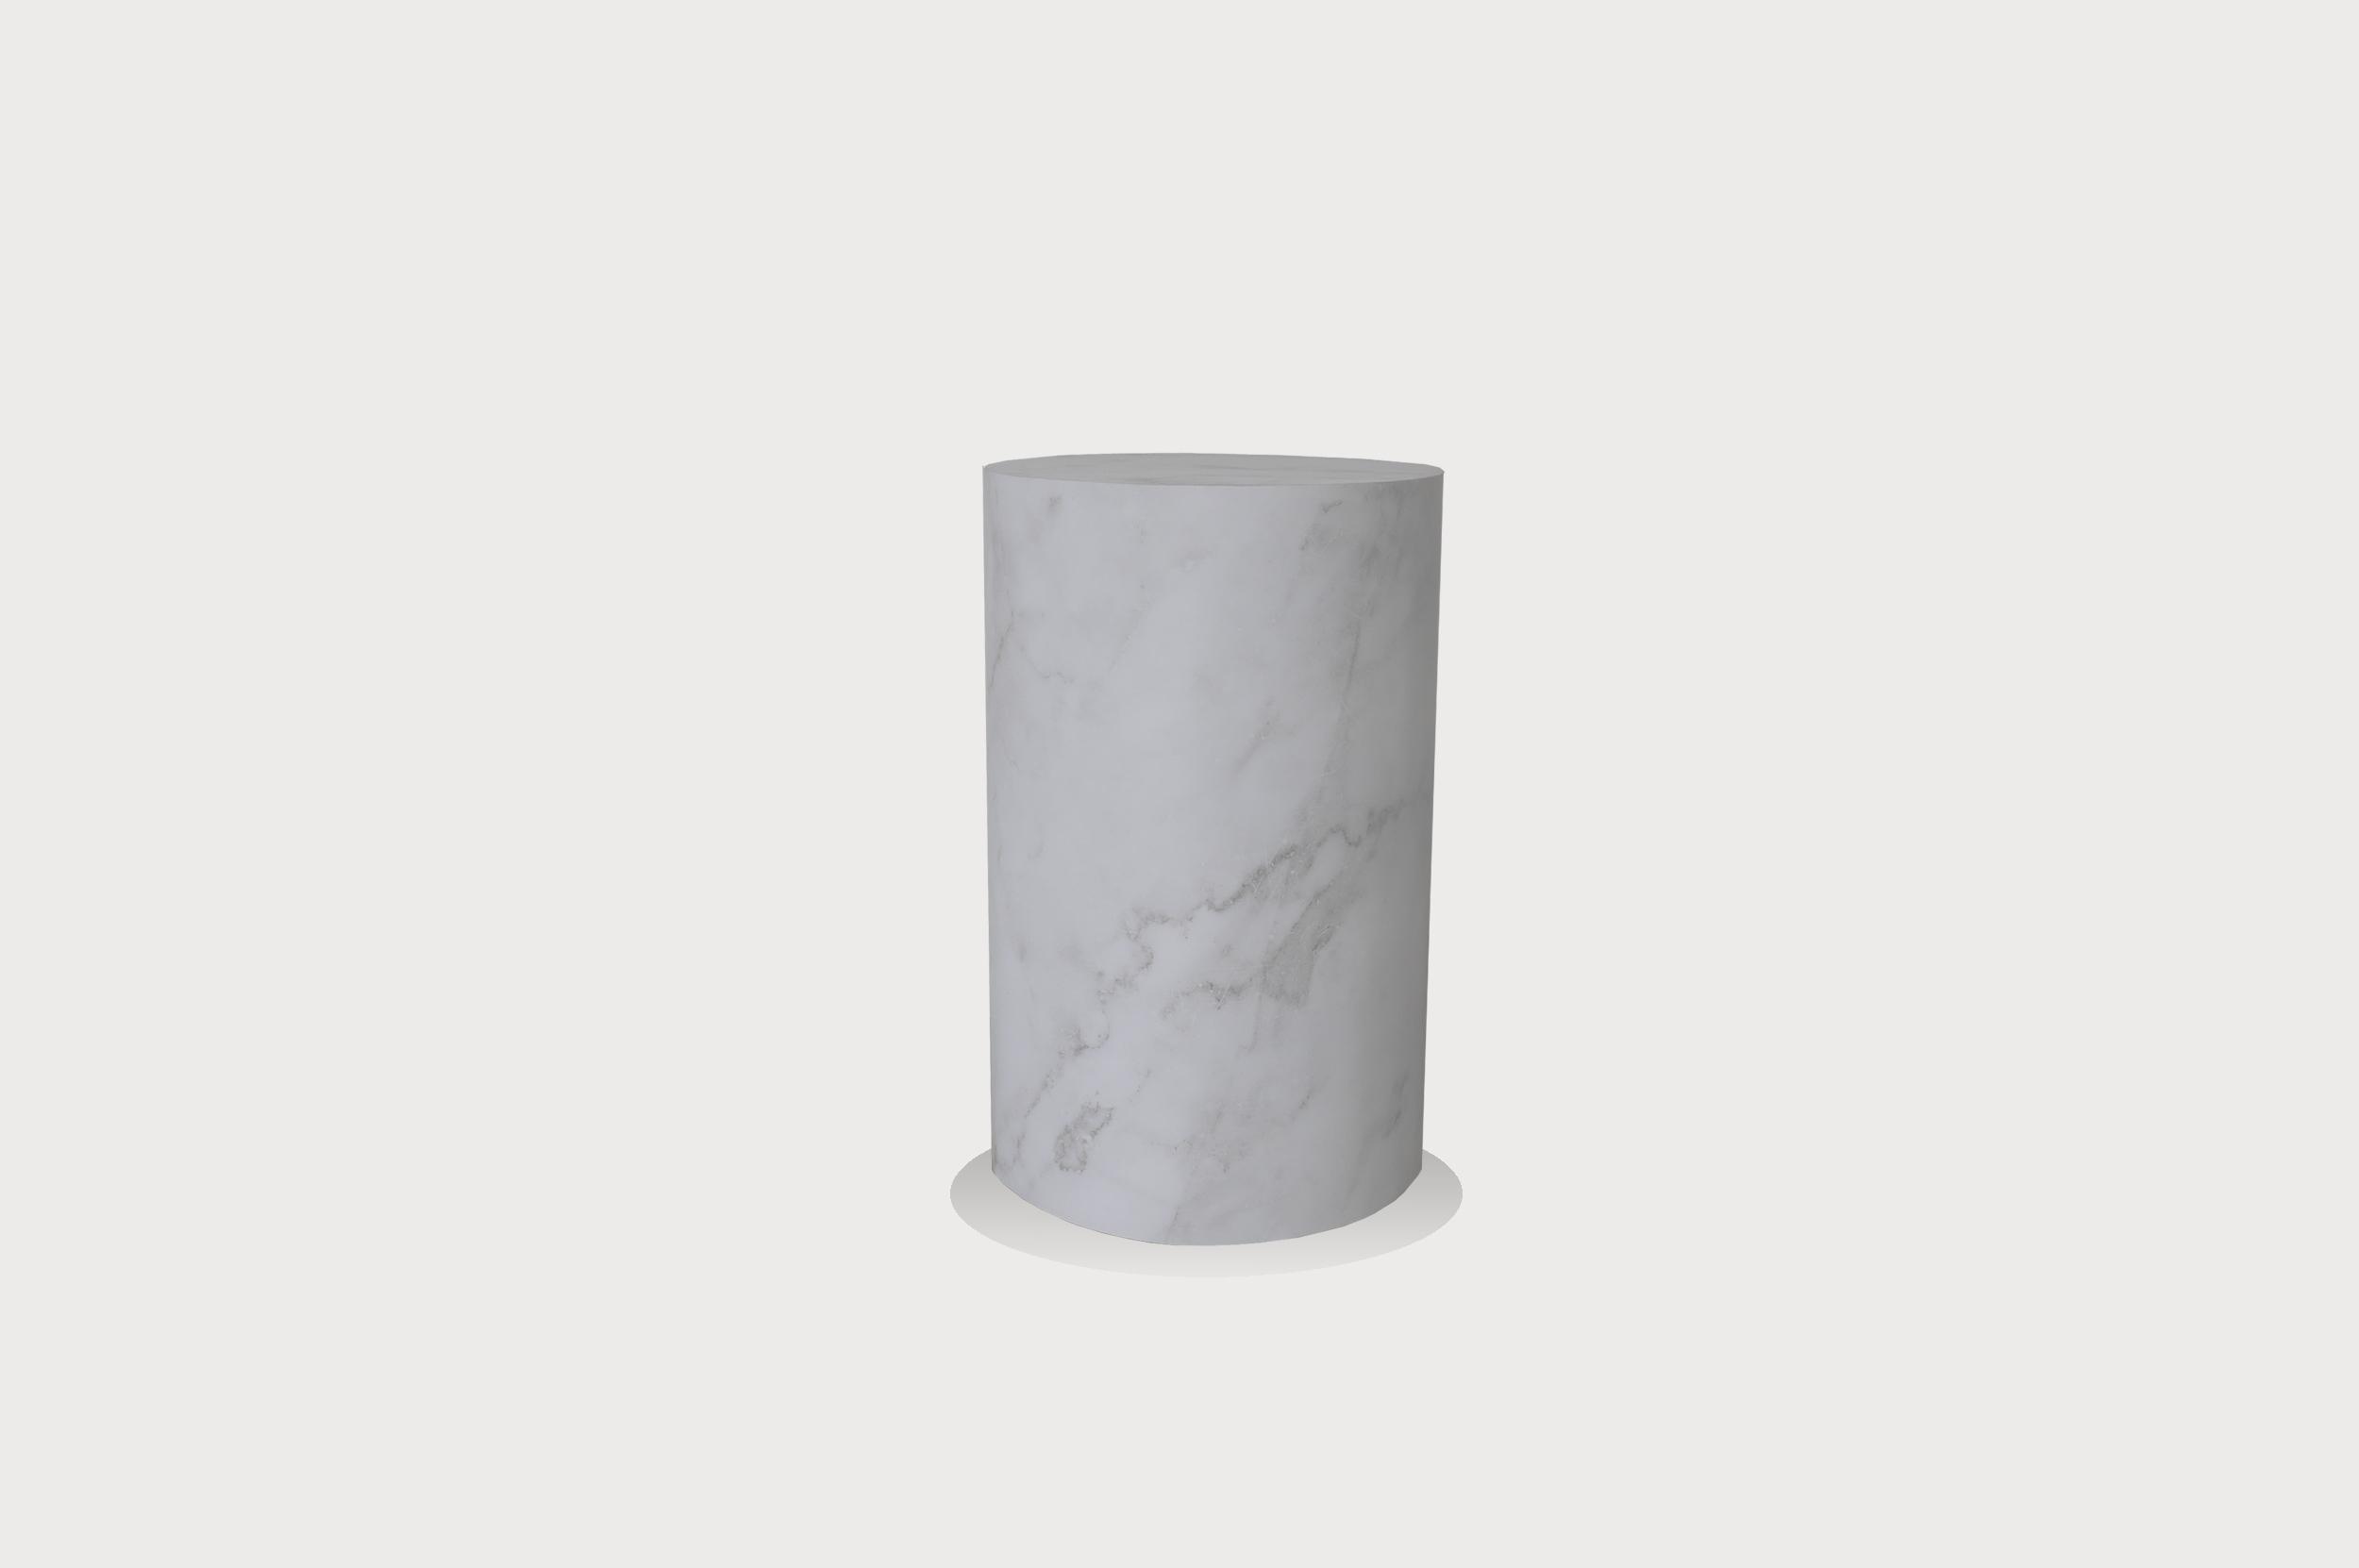 Round marble striped plinth